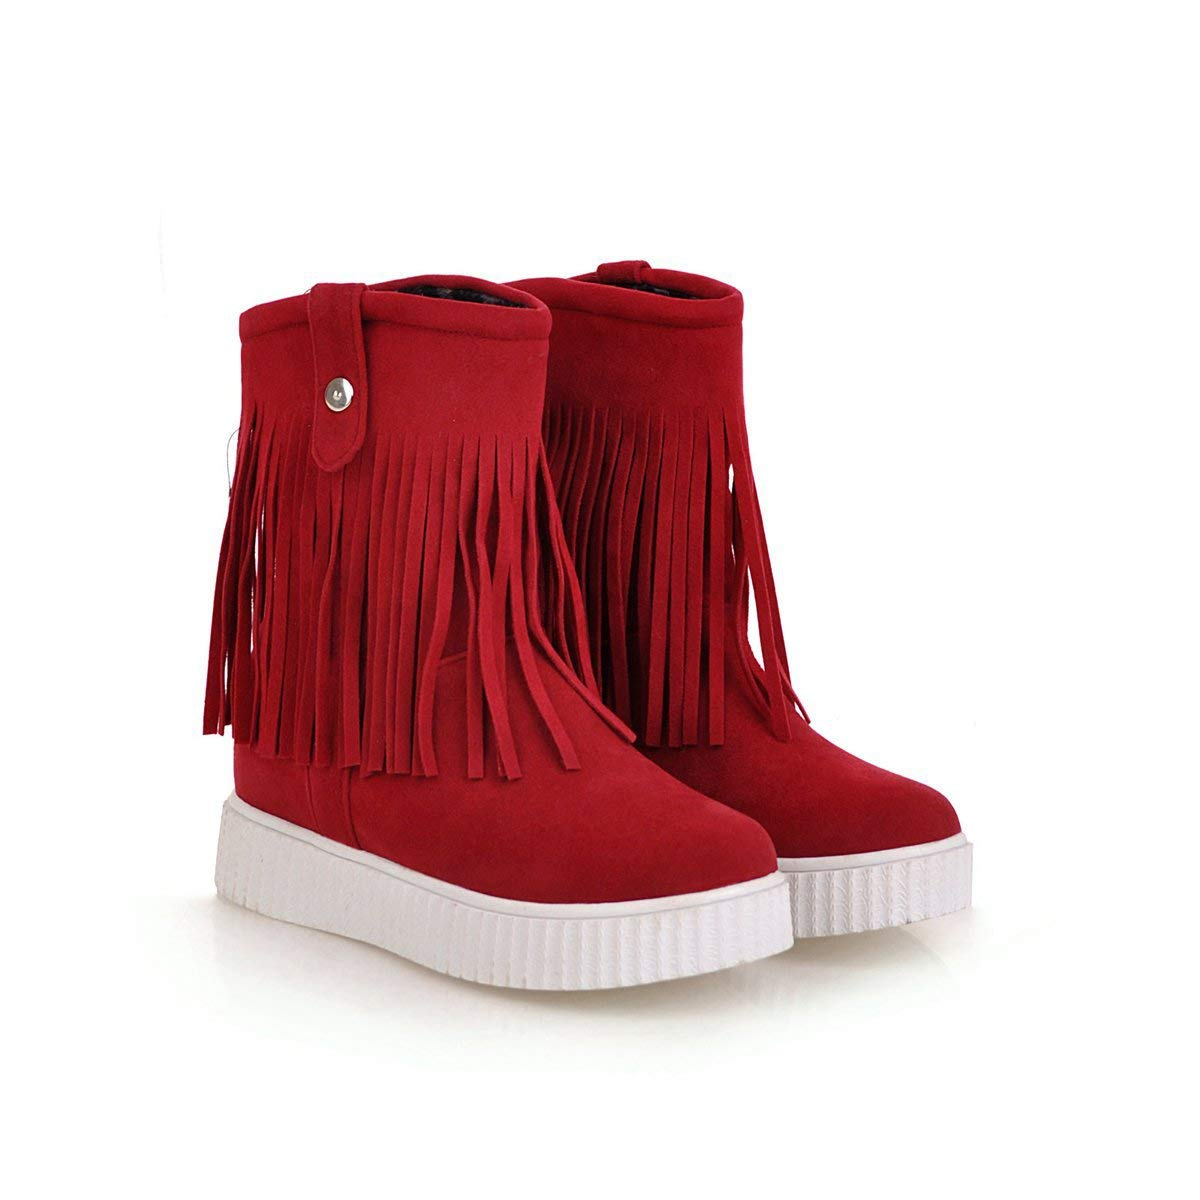 Damen Flache Ferse mit dicken unteren kurzen Ankle Stiefel Stiefel Stiefel 04e8de